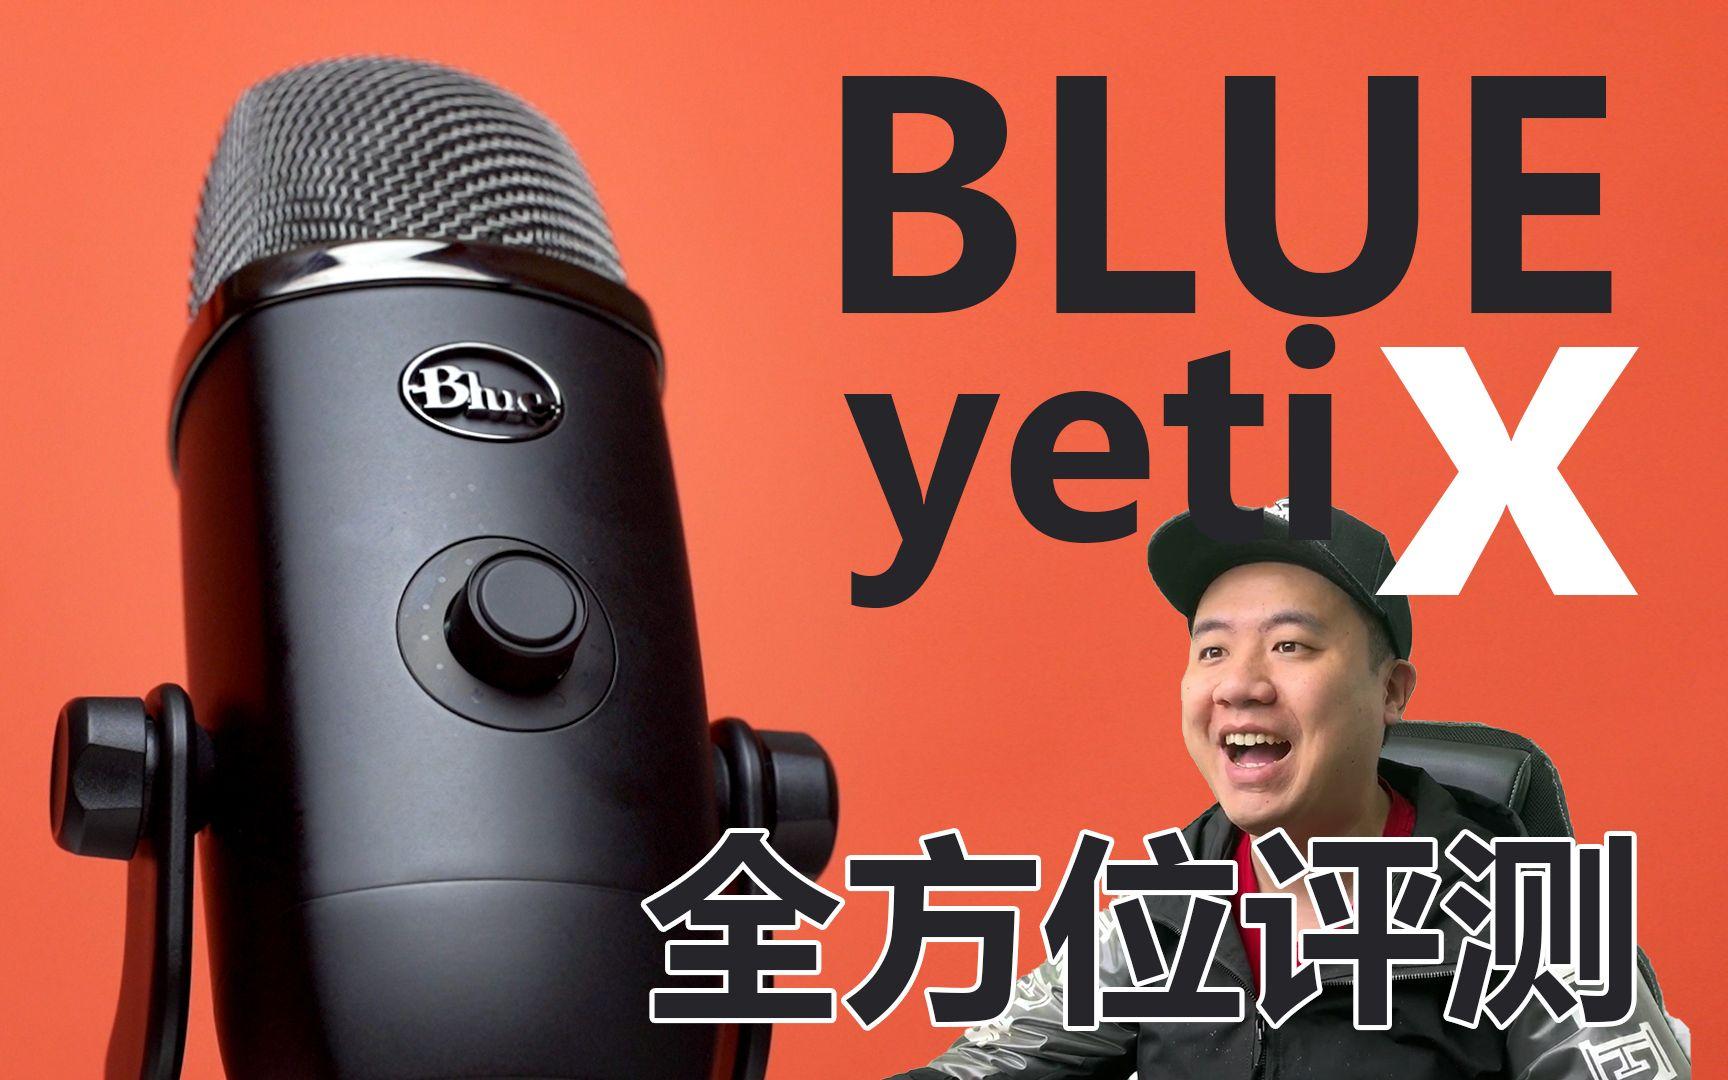 1700塊的麥克風有多強?BLUE YETI X 游戲吃播唱歌直播全方位評測_嗶哩嗶哩 (゜-゜)つロ 干杯~-bilibili